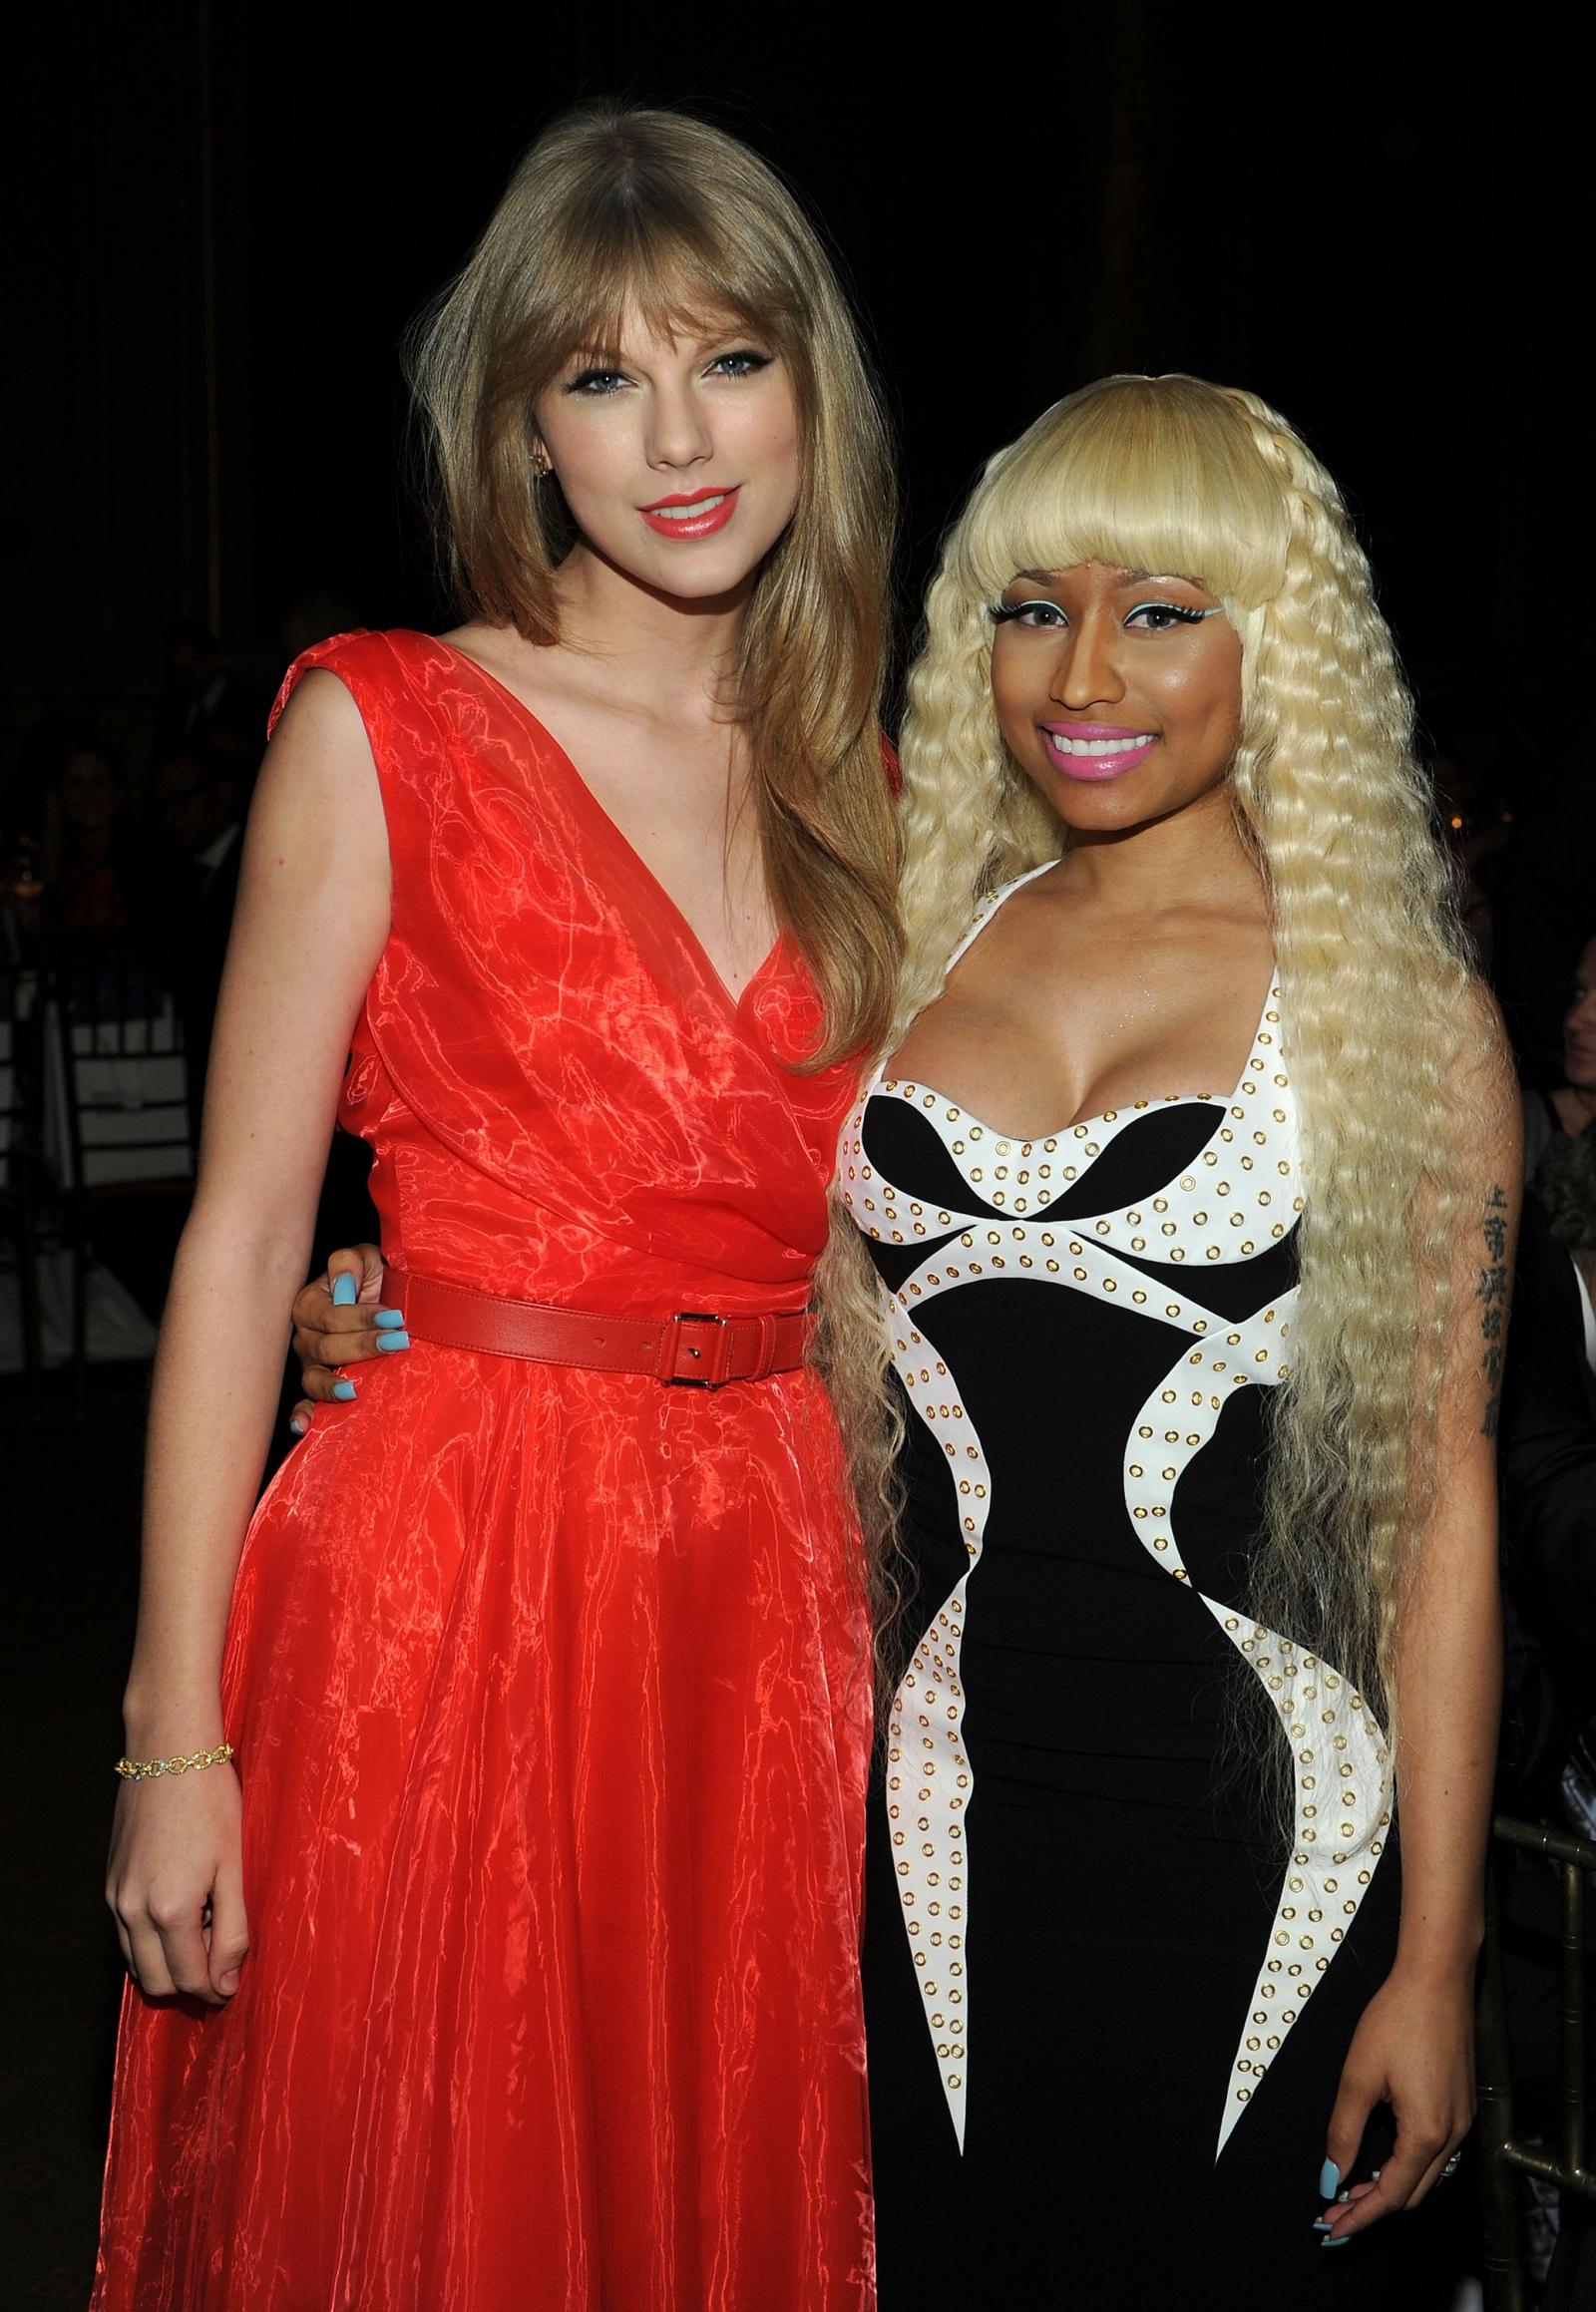 Taylor Swift and Nicki Minaj feud